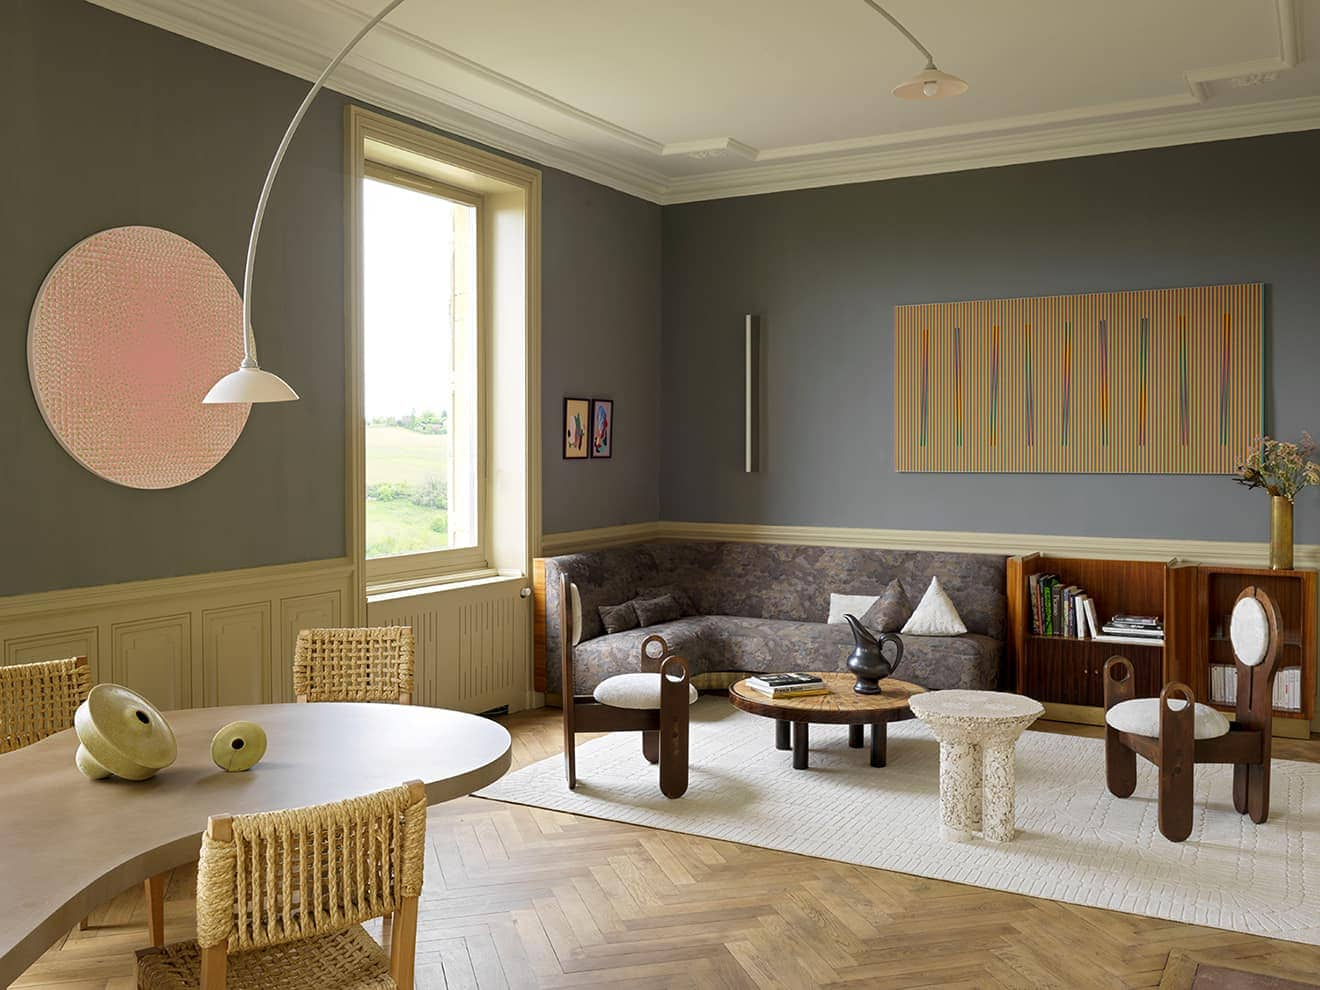 Demeure beaujolaise, grand cru architectural